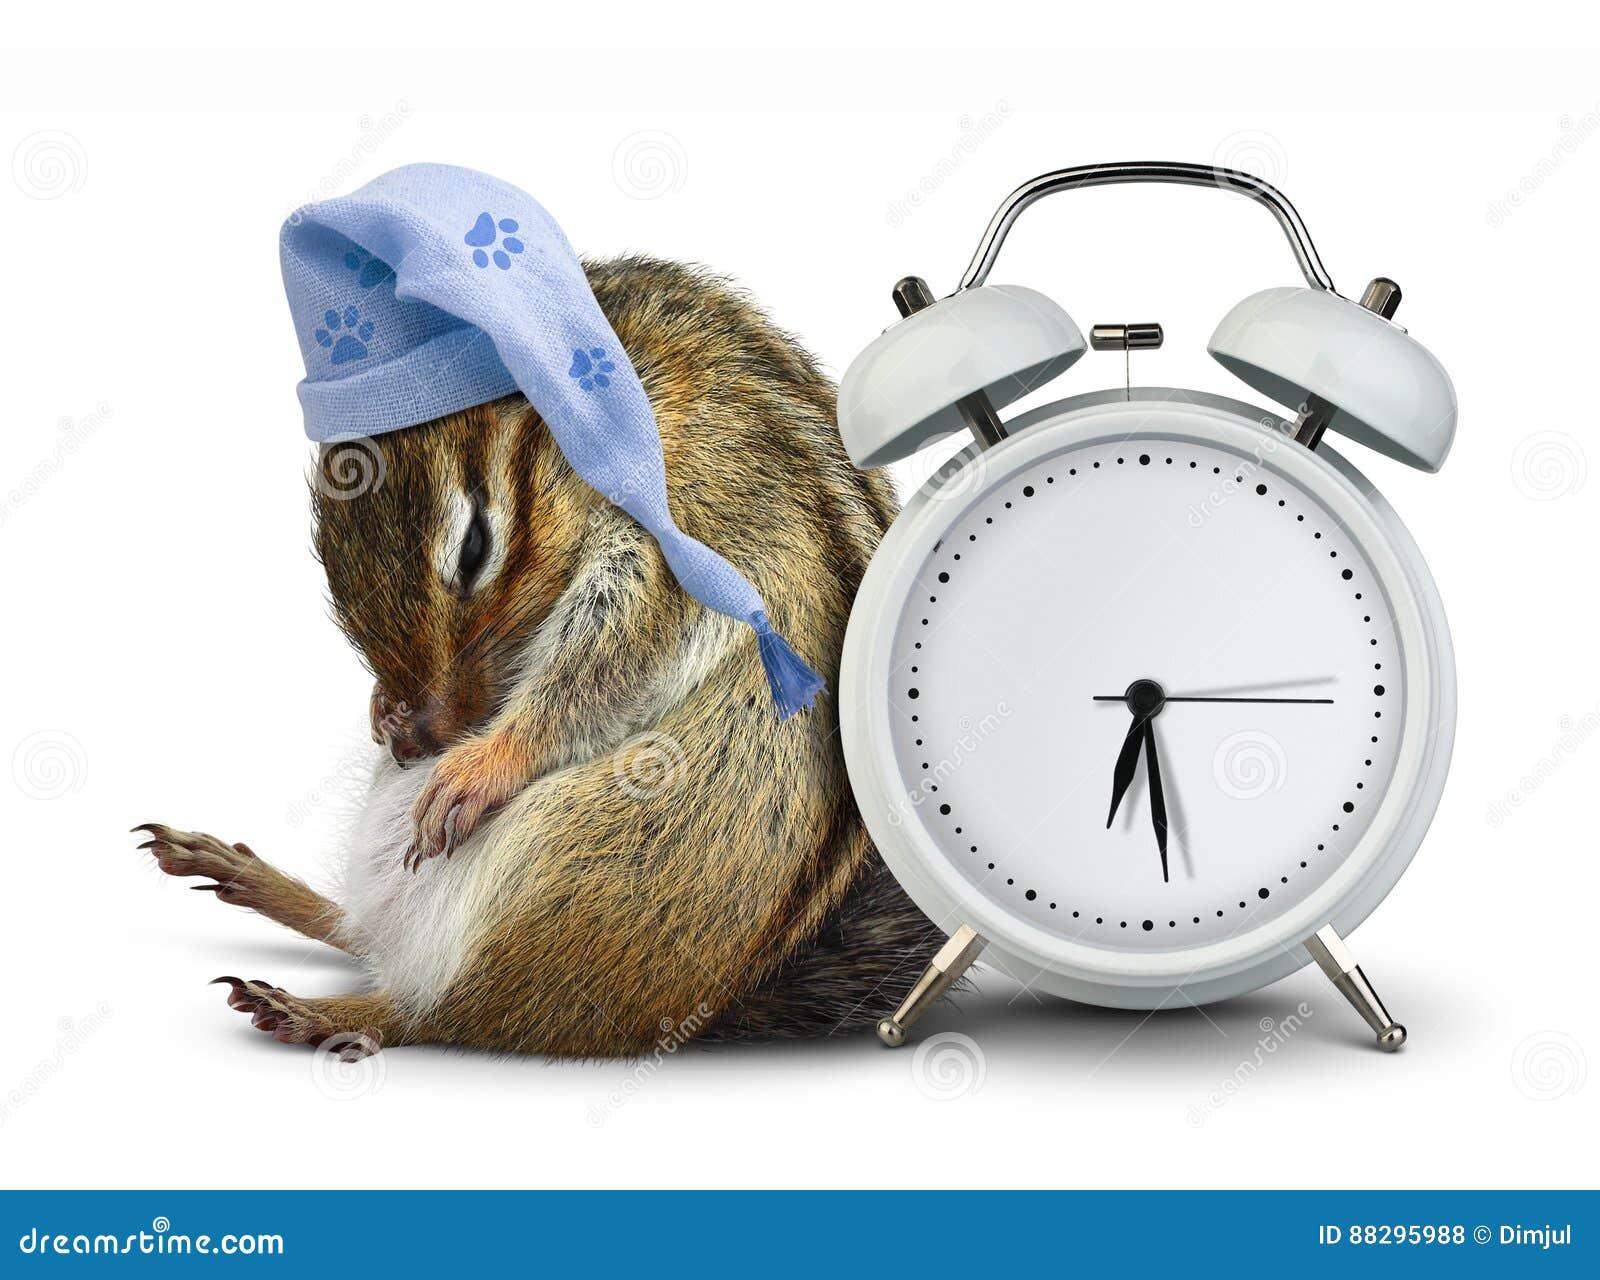 Funny animal chipmunk sleep with clock blank and sleeping hat